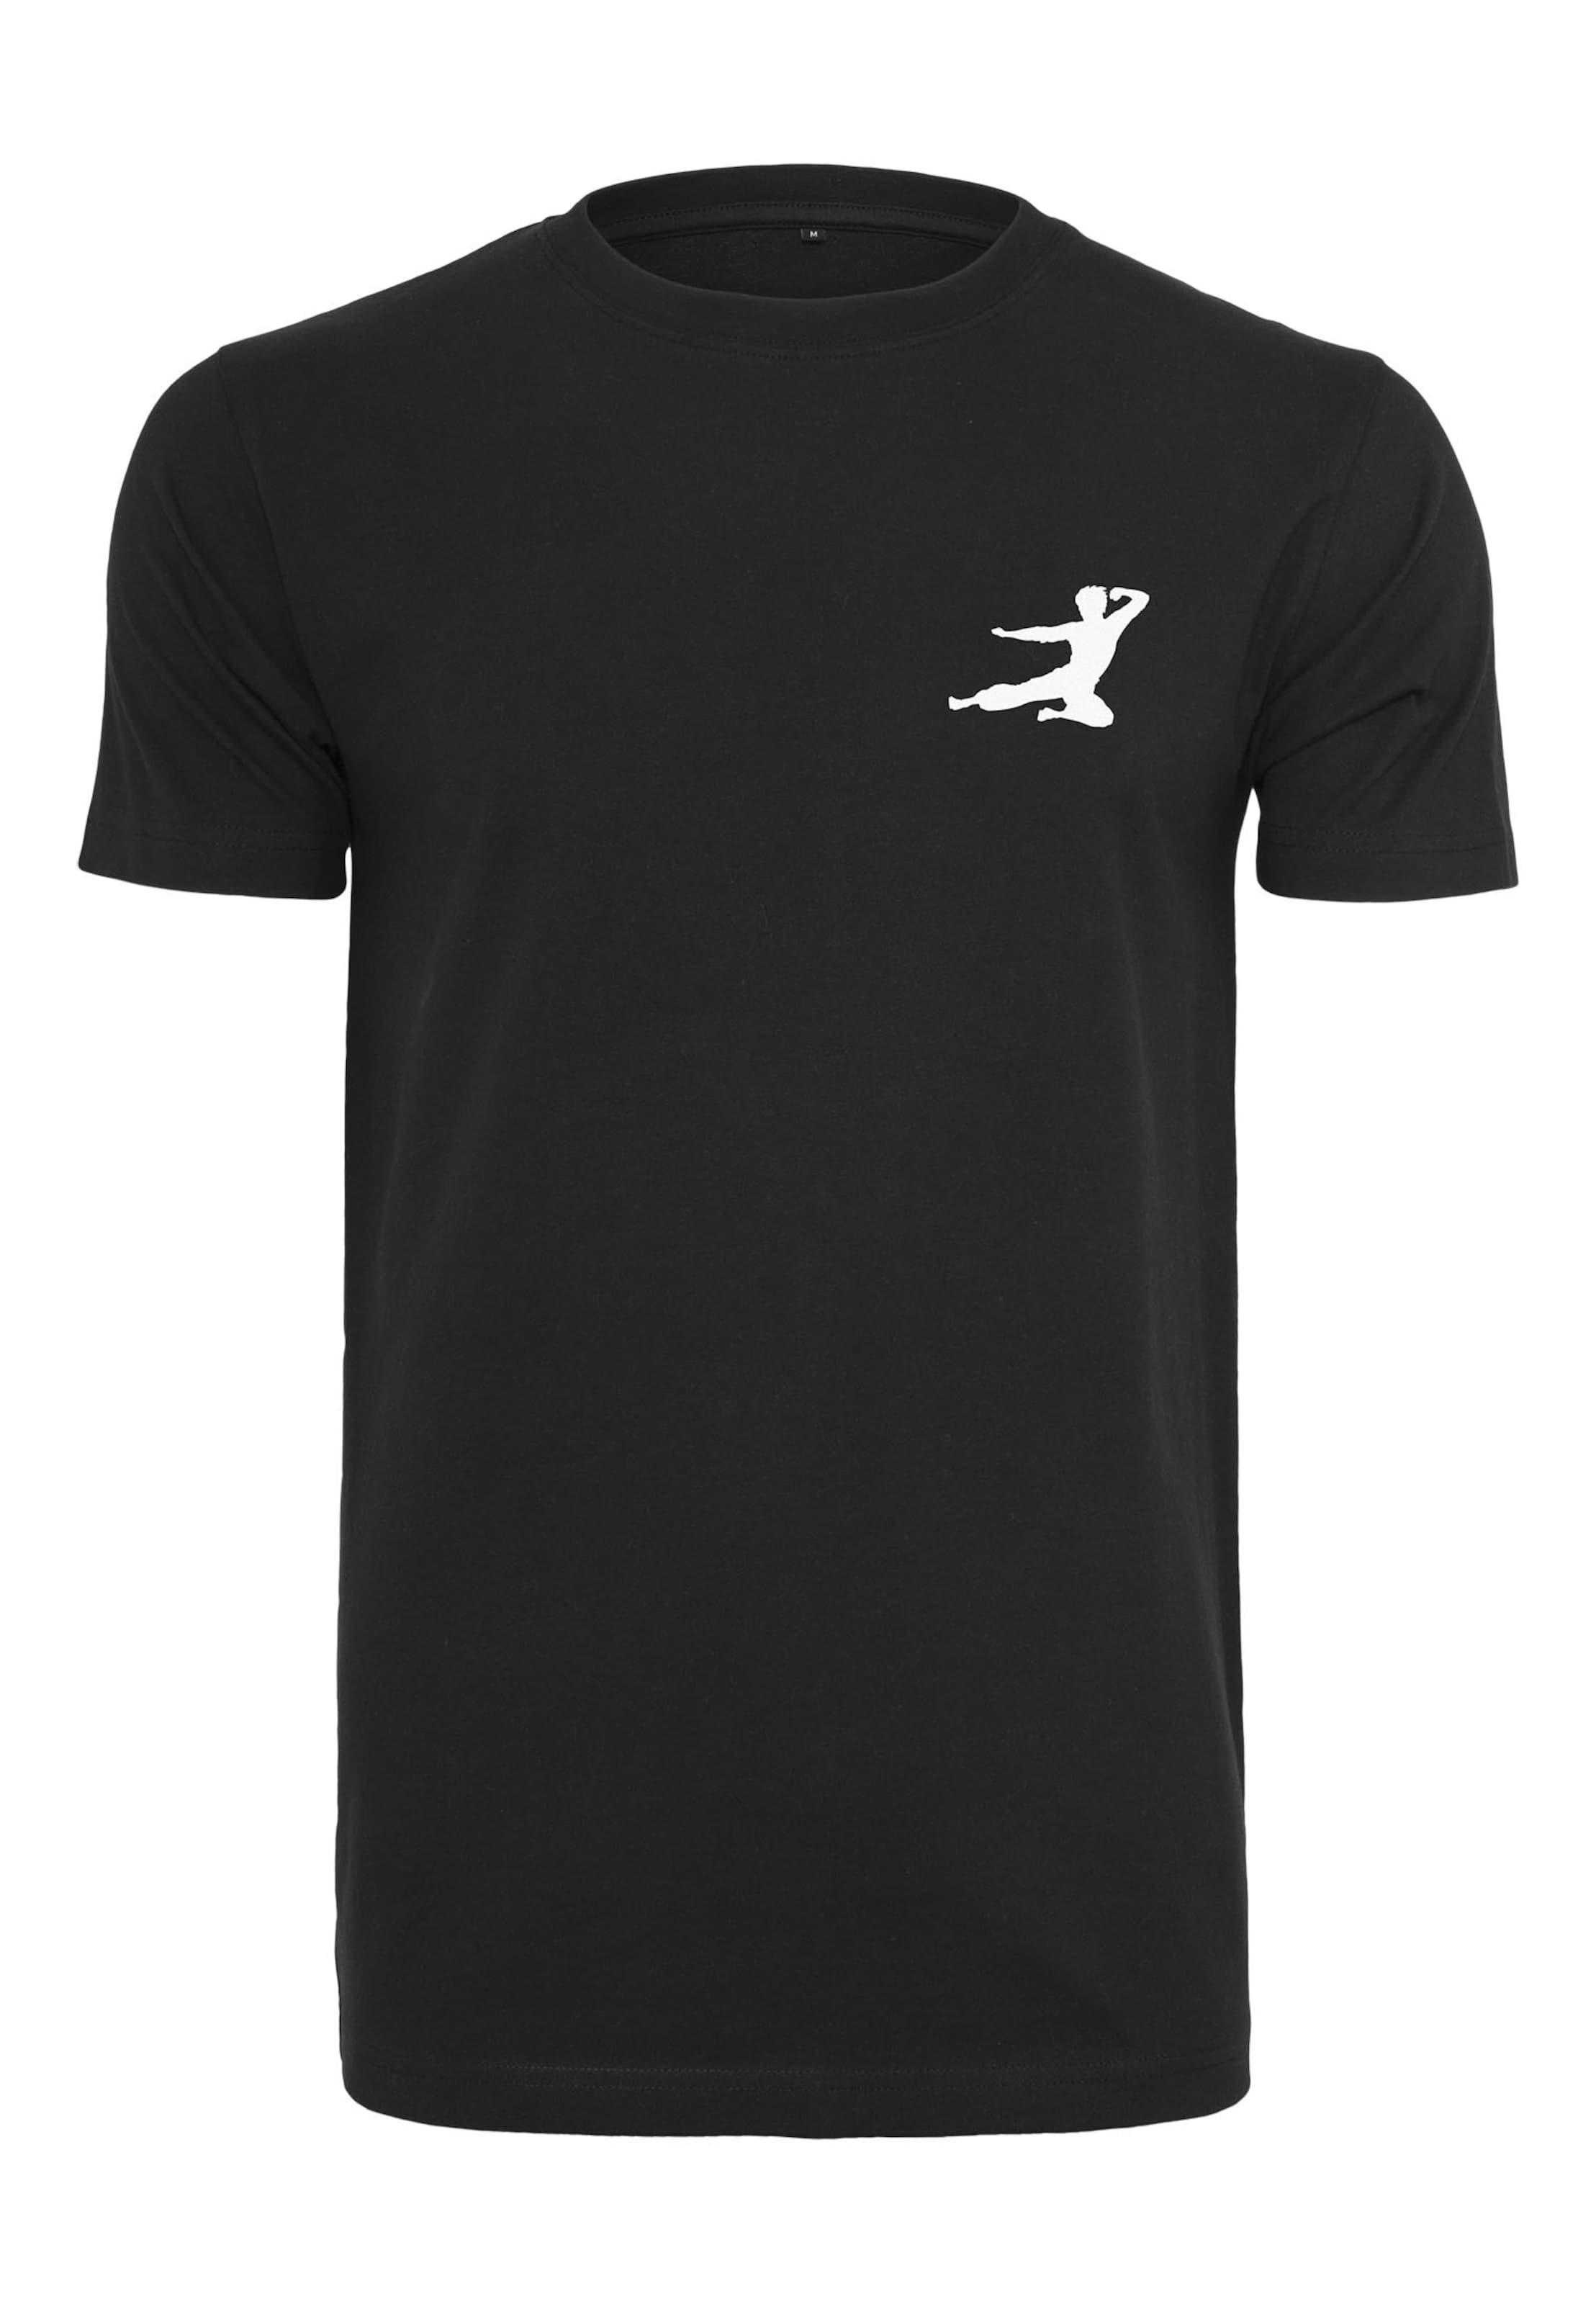 Tee Logo' Mister Lee In 'bruce SchwarzWeiß Shirt hQtsCrd